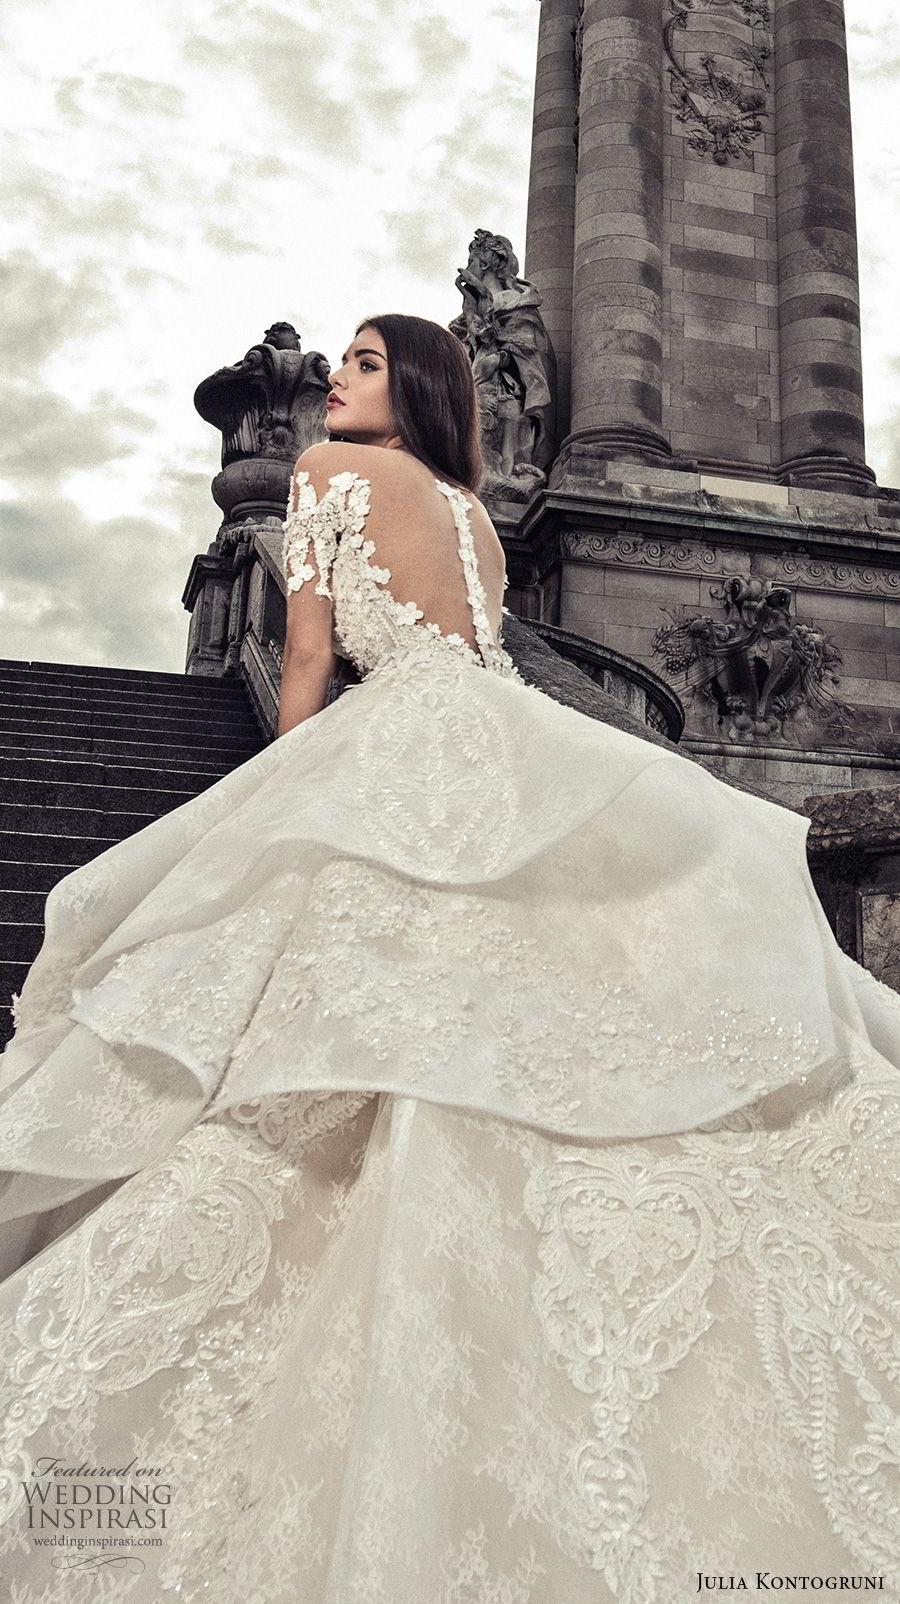 julia kontogruni 2018 bridal half sleeves off shoulder sweetheart neckline full embellishment peplum layered skirt ball gown wedding dress sheer button royal train (4) zbv